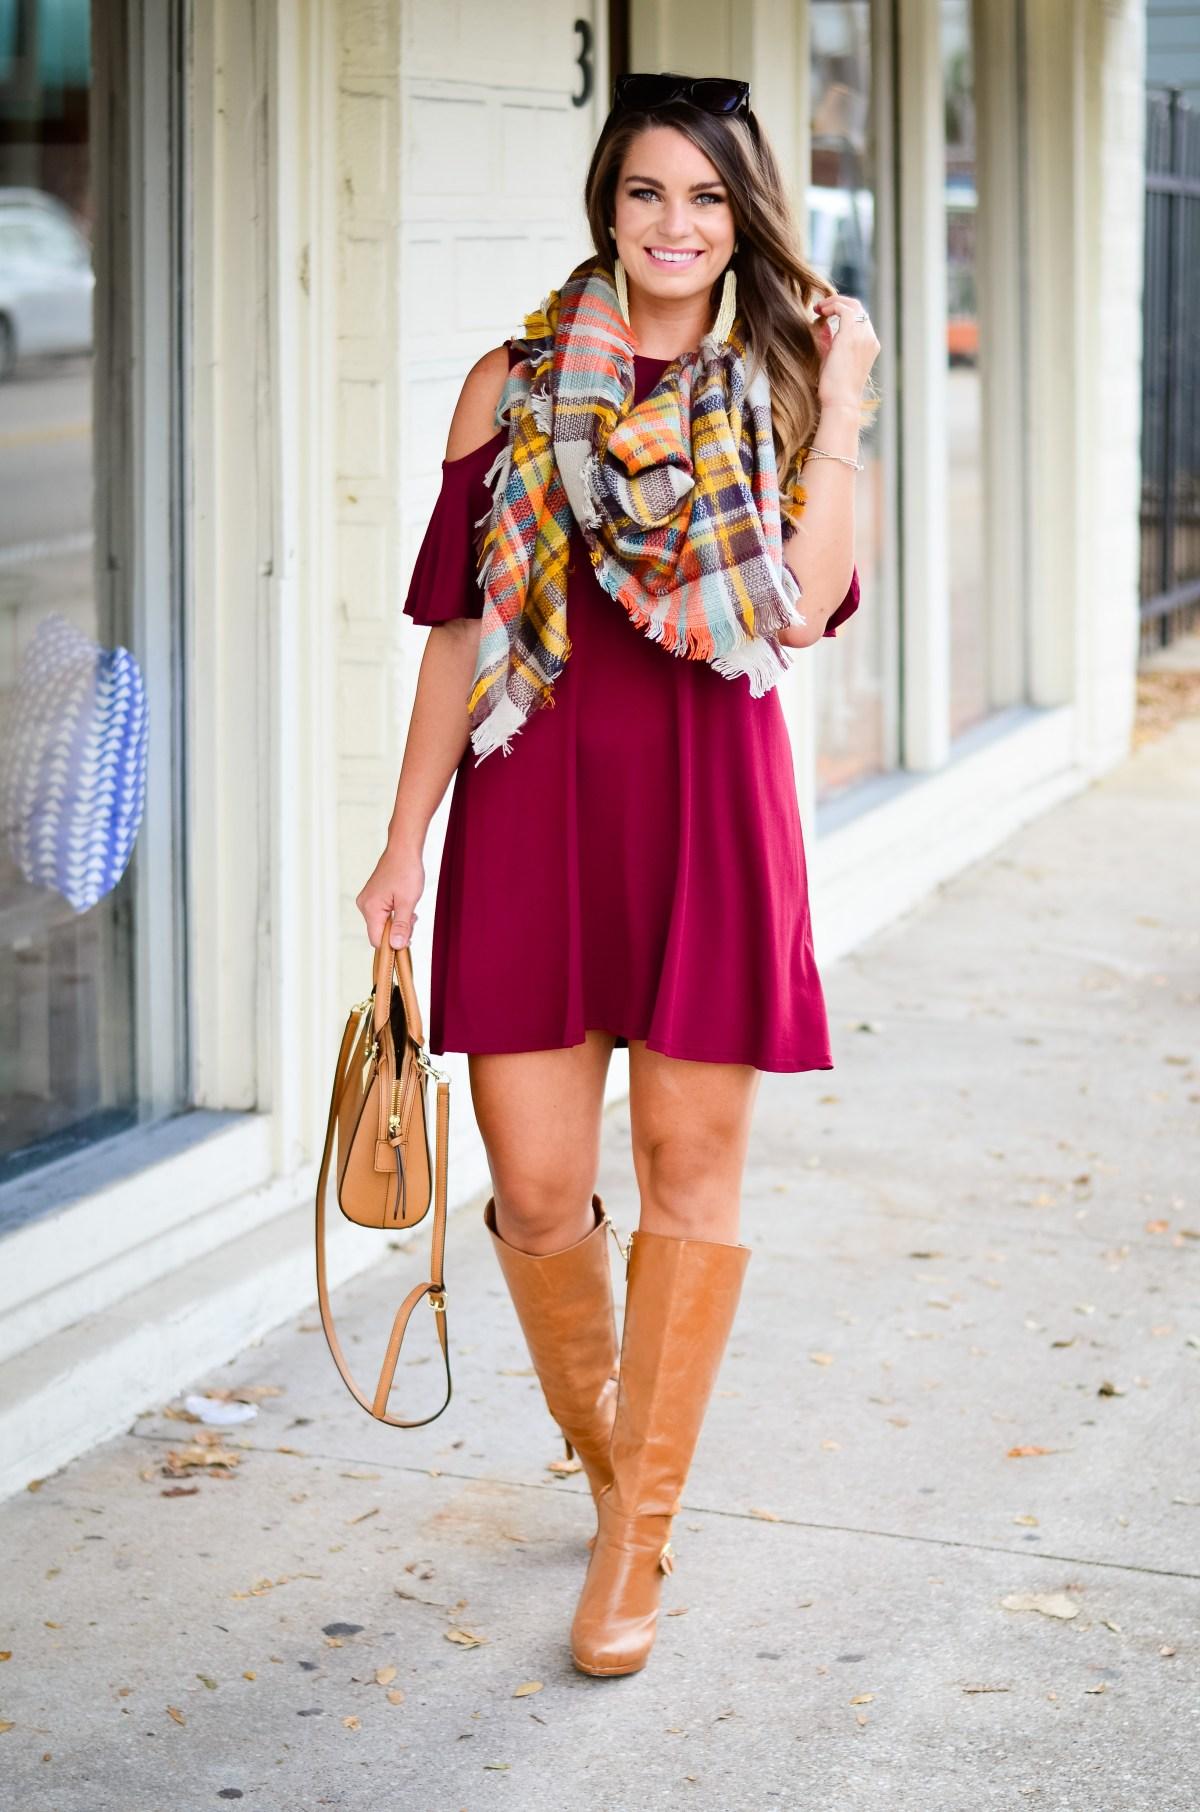 maroon-dress-blanket-scarf-goldfinch-17